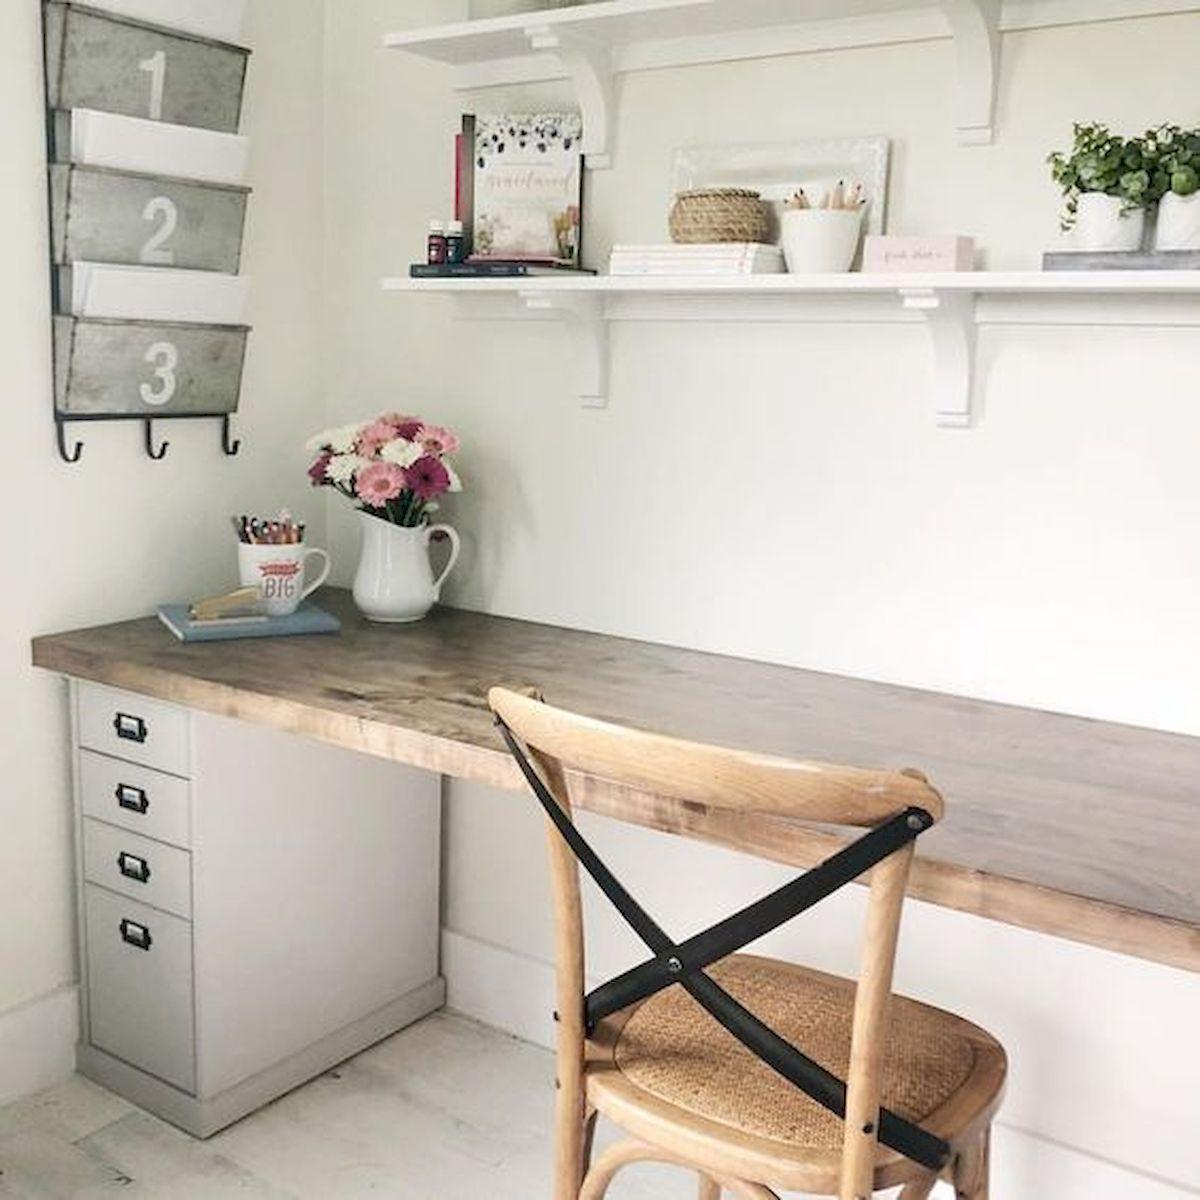 55 Incredible Diy Office Desk Design Ideas And Decor 11 Office Desk Designs Diy Office Desk Home Office Furniture